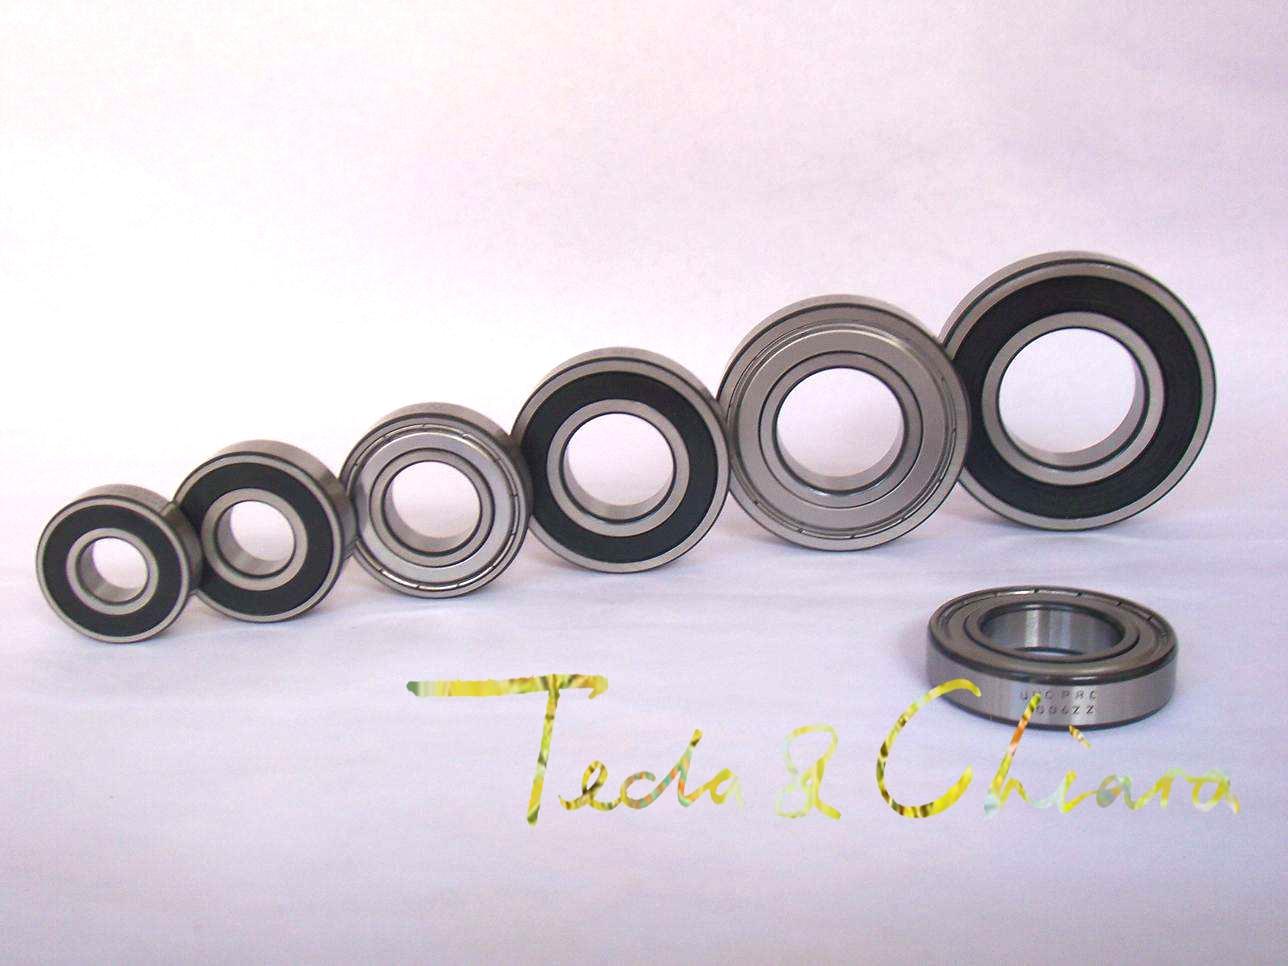 10Pcs 675-2Z 675ZZ MR85 MR85ZZ MR85RS MR85-2Z MR85Z MR85-2RS ZZ RS RZ 2RZ L-850 Deep Groove Ball Bearings 5 x 8 x 2.5mm free shipping 10 pcs open type mr85 bearings 5x8x2 5 mm miniature ball bearings l 850 mr85